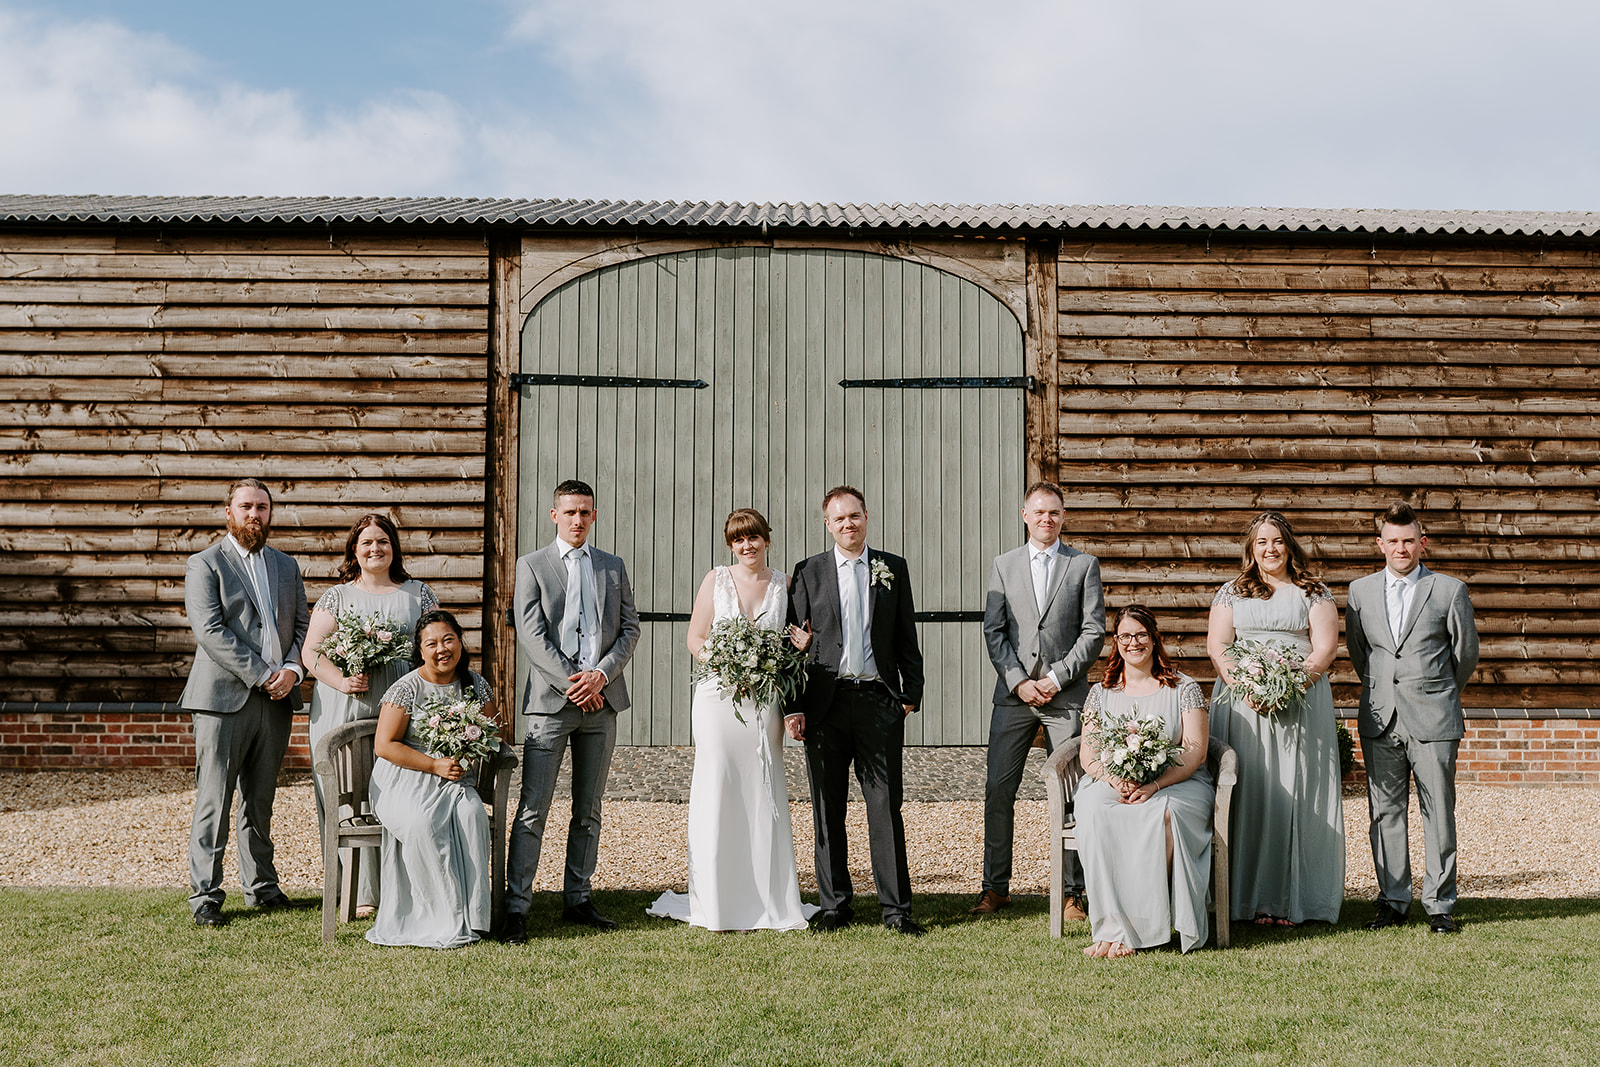 posed bridal party group wedding photos at primrose hill farm